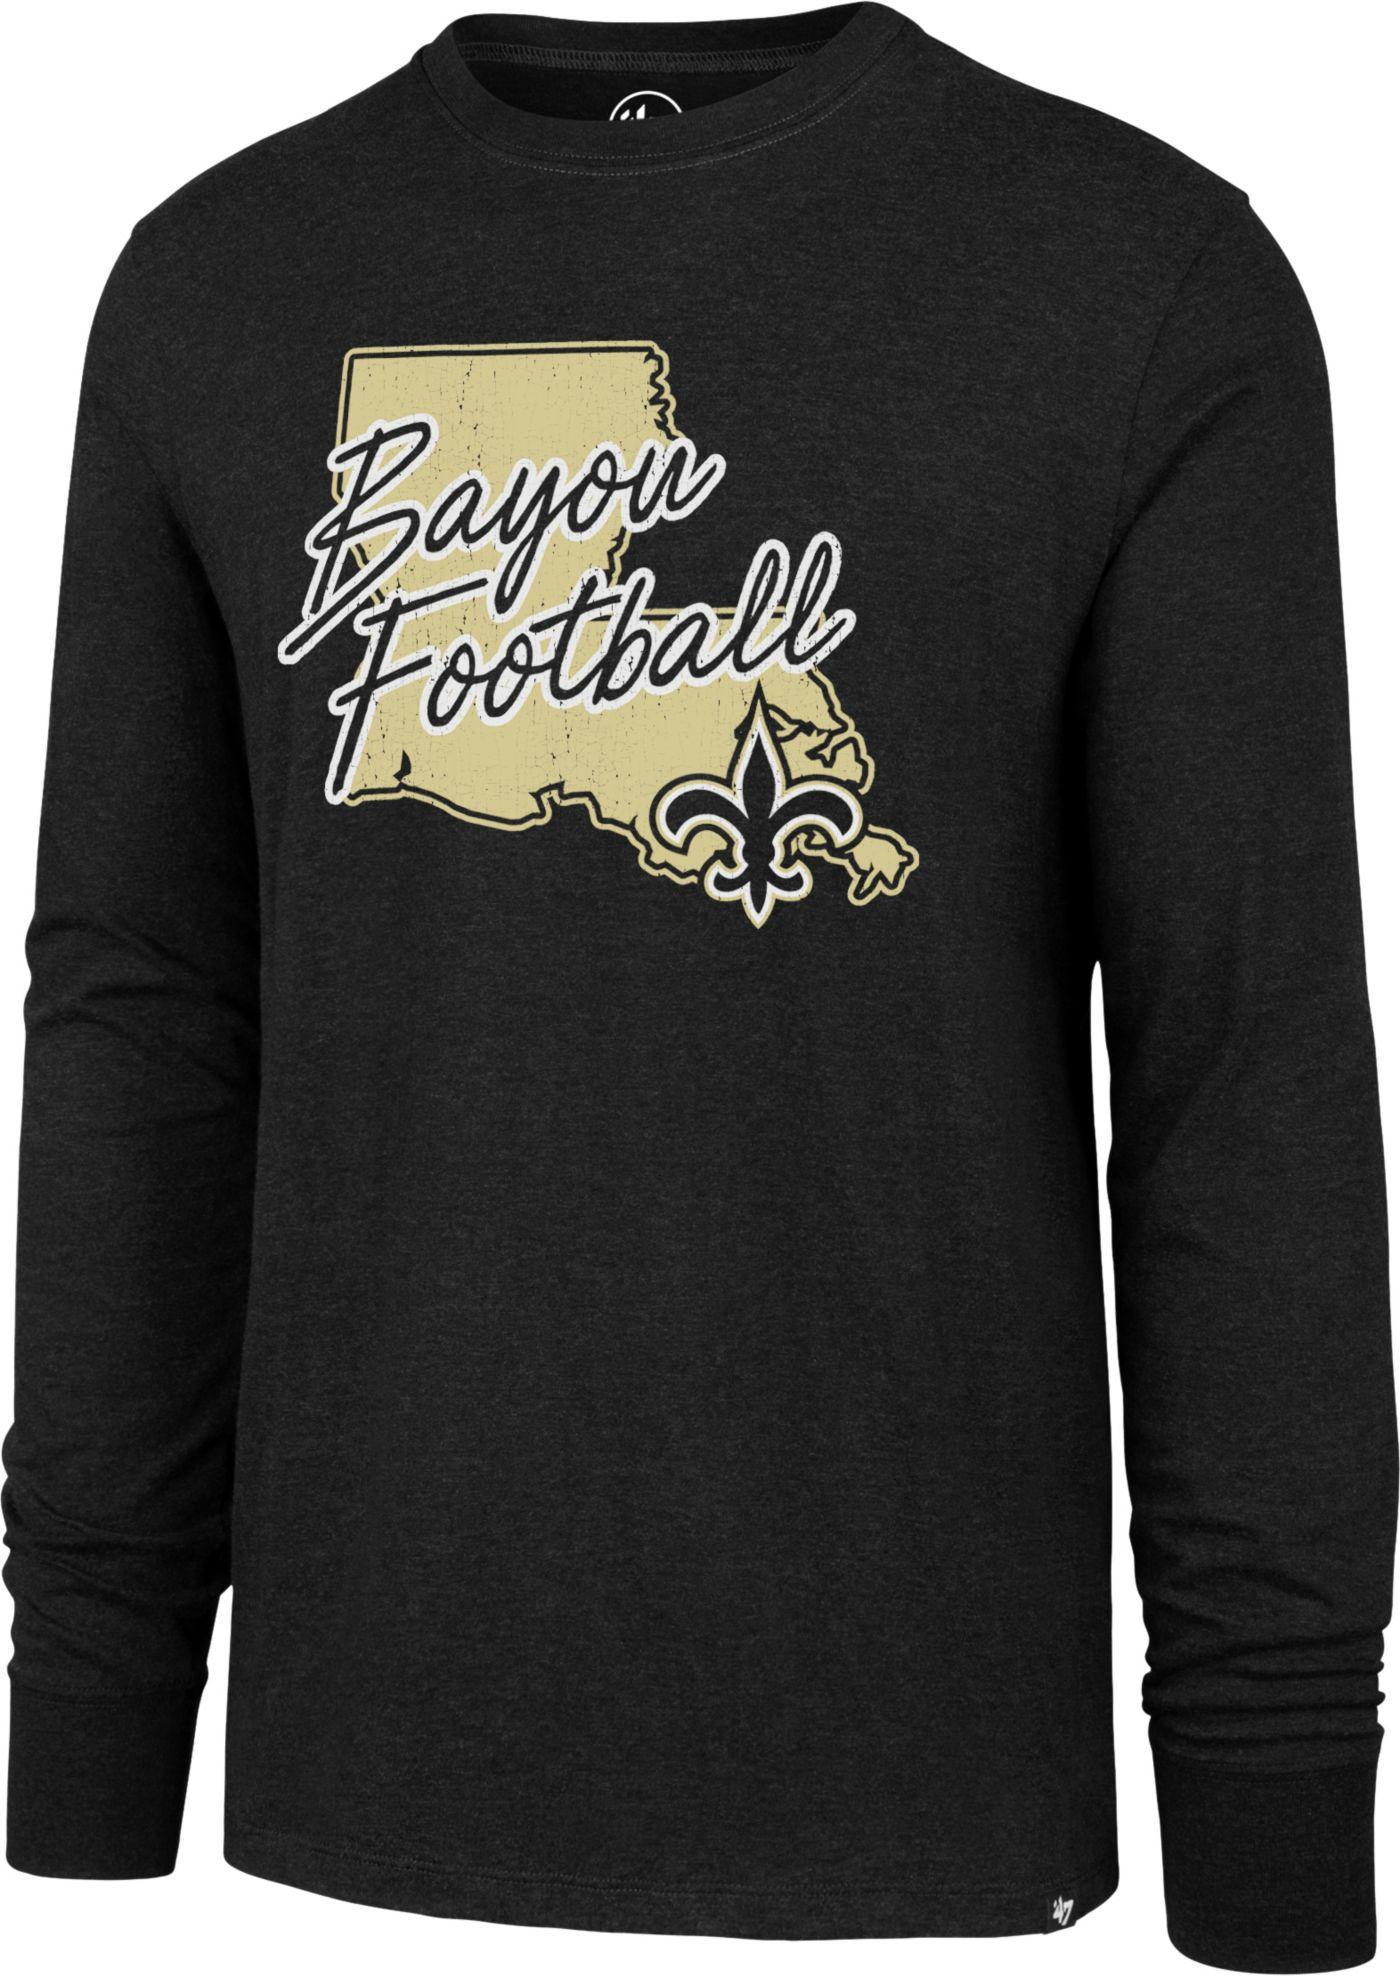 '47 Men's New Orleans Saints Bayou Football Club Black Long Sleeve Shirt